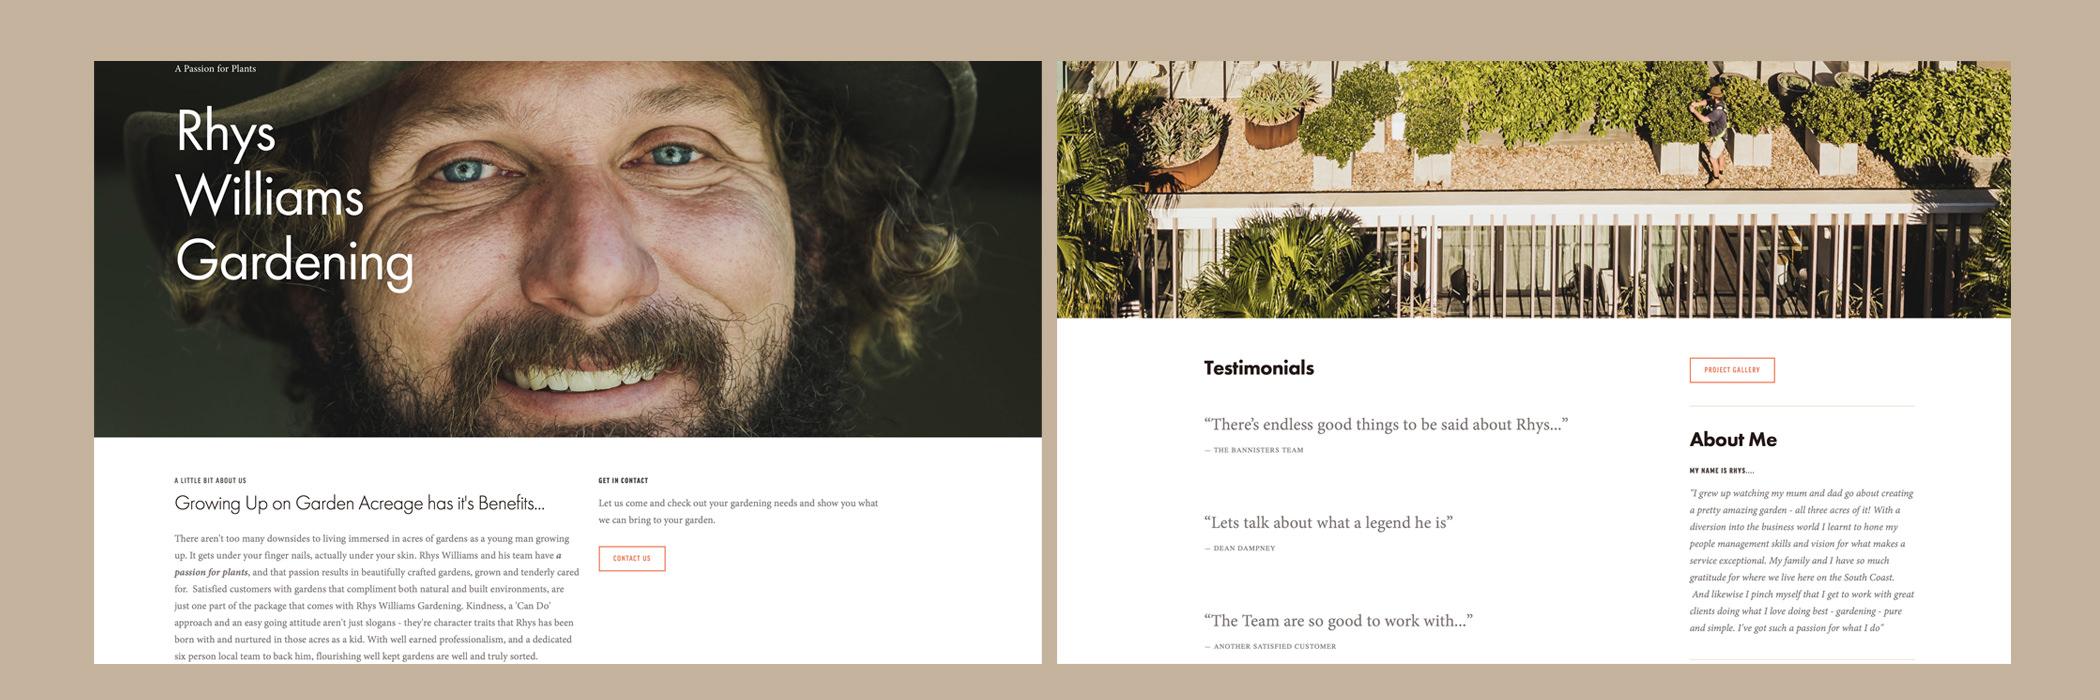 Rhys Williams Gardening.jpg